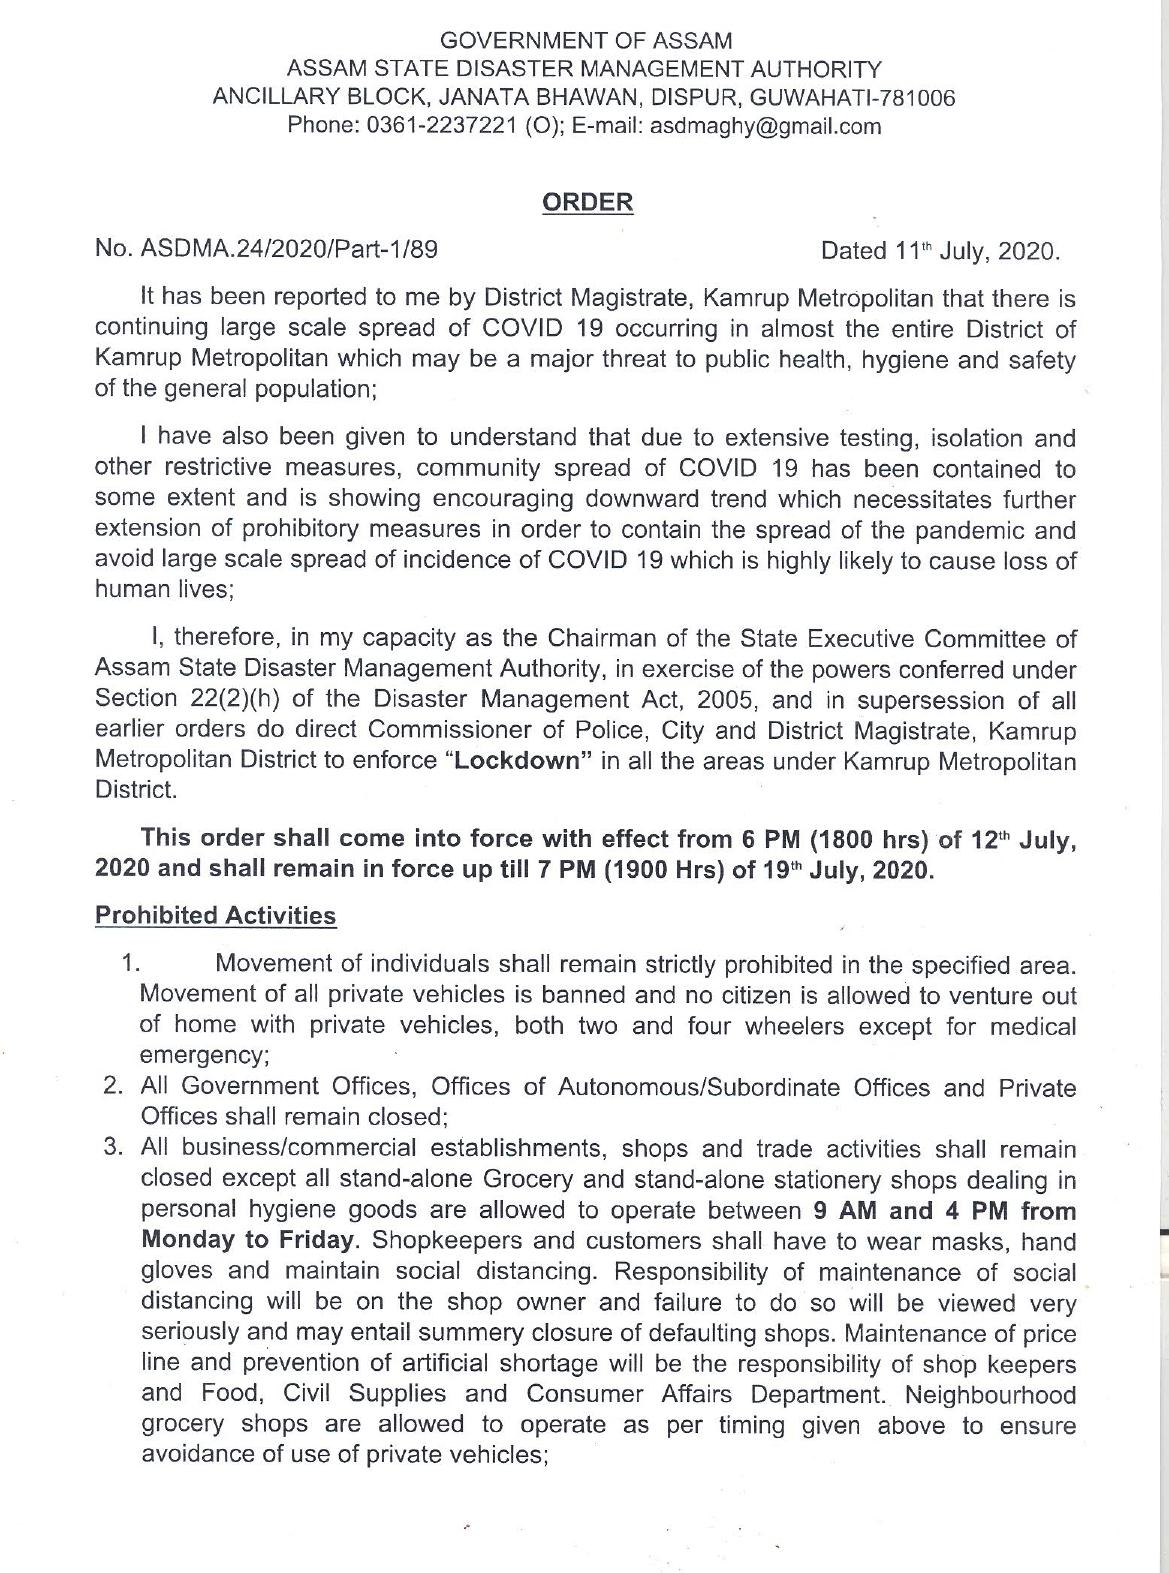 order issued by Assam Chief Secretary Kumar Sanjay Krishna